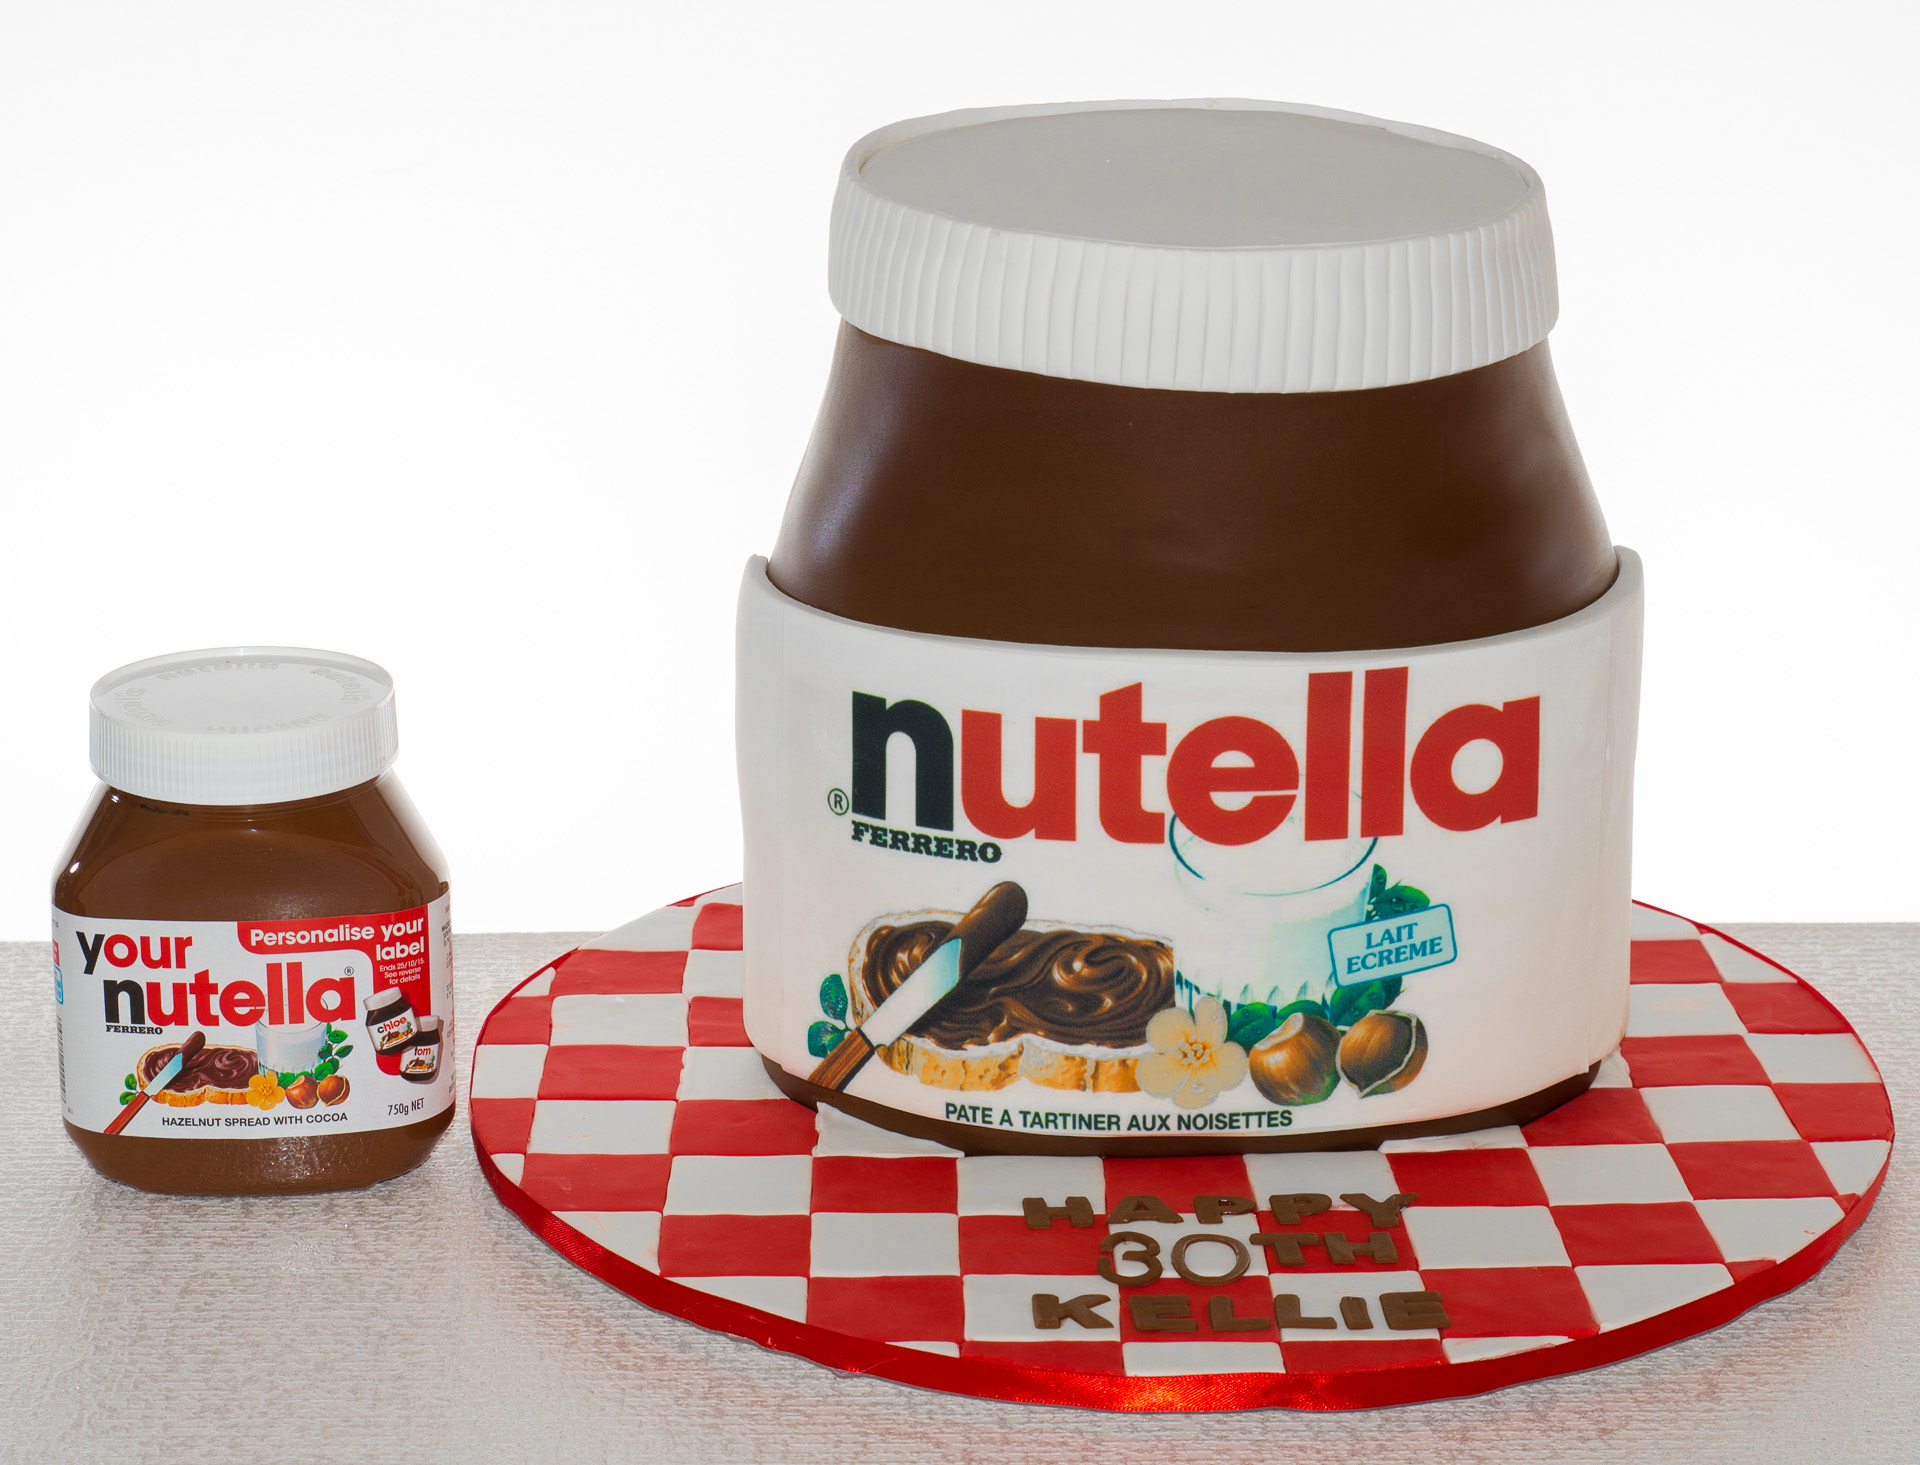 Nutella-Jar-Birthday-Cake.jpg